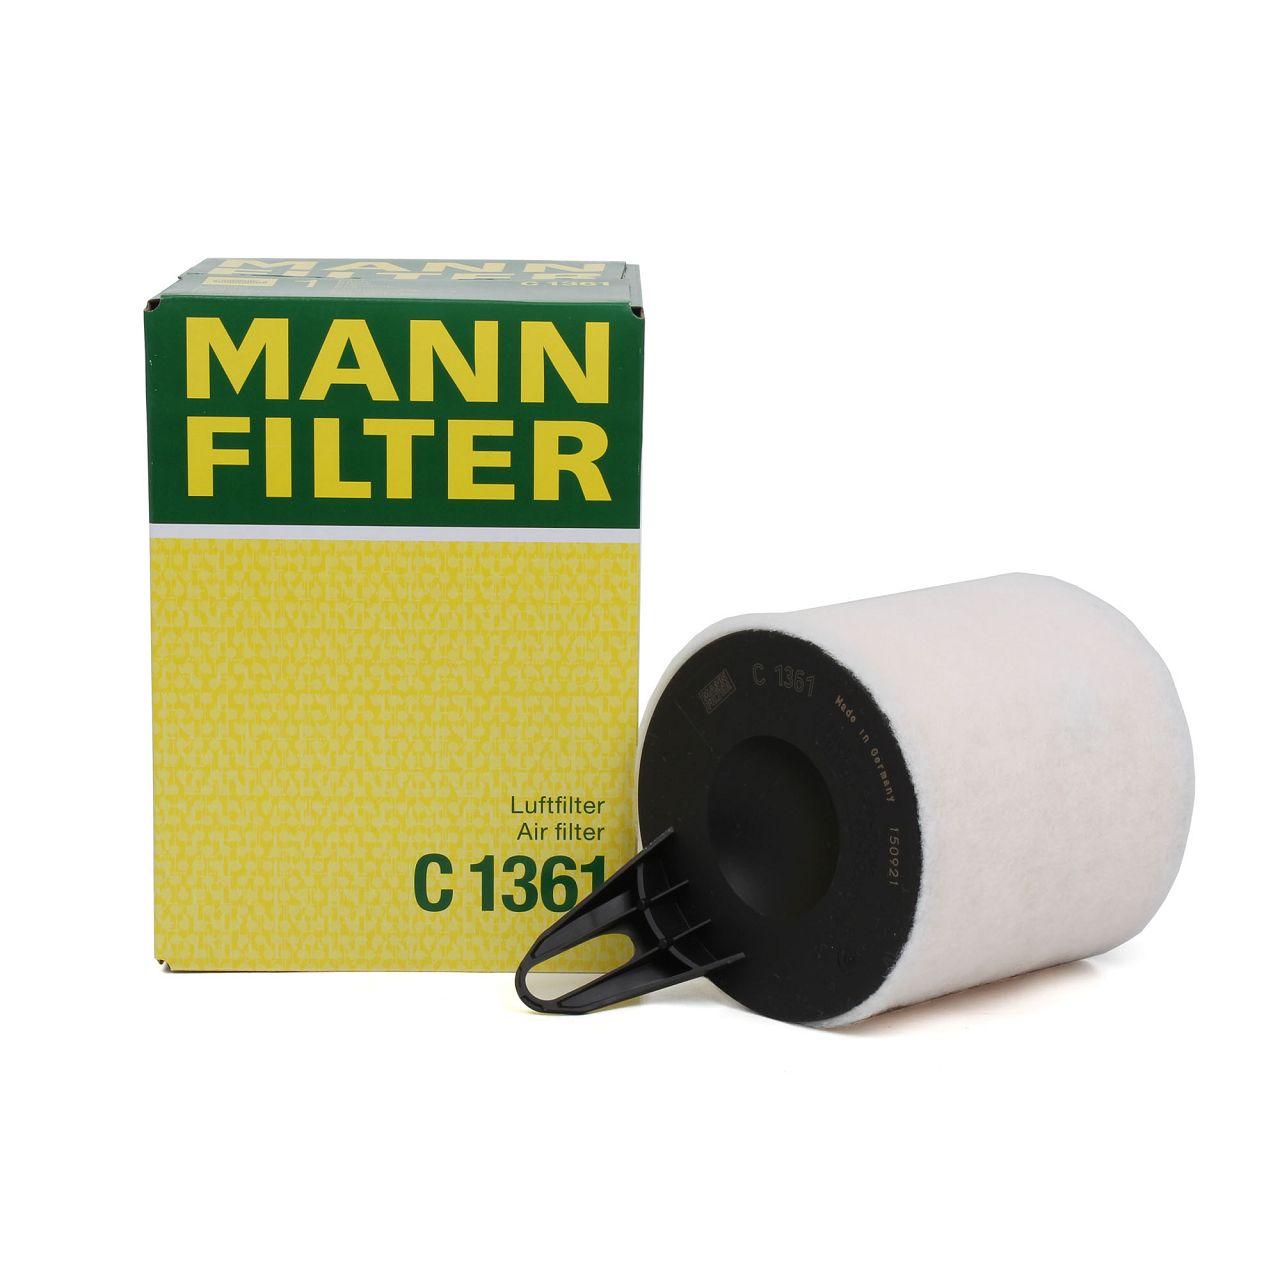 MANN Luftfilter C1361 BMW 1er E81 E87 E88 E82 2er F23 F22 3er E90 E91 E92